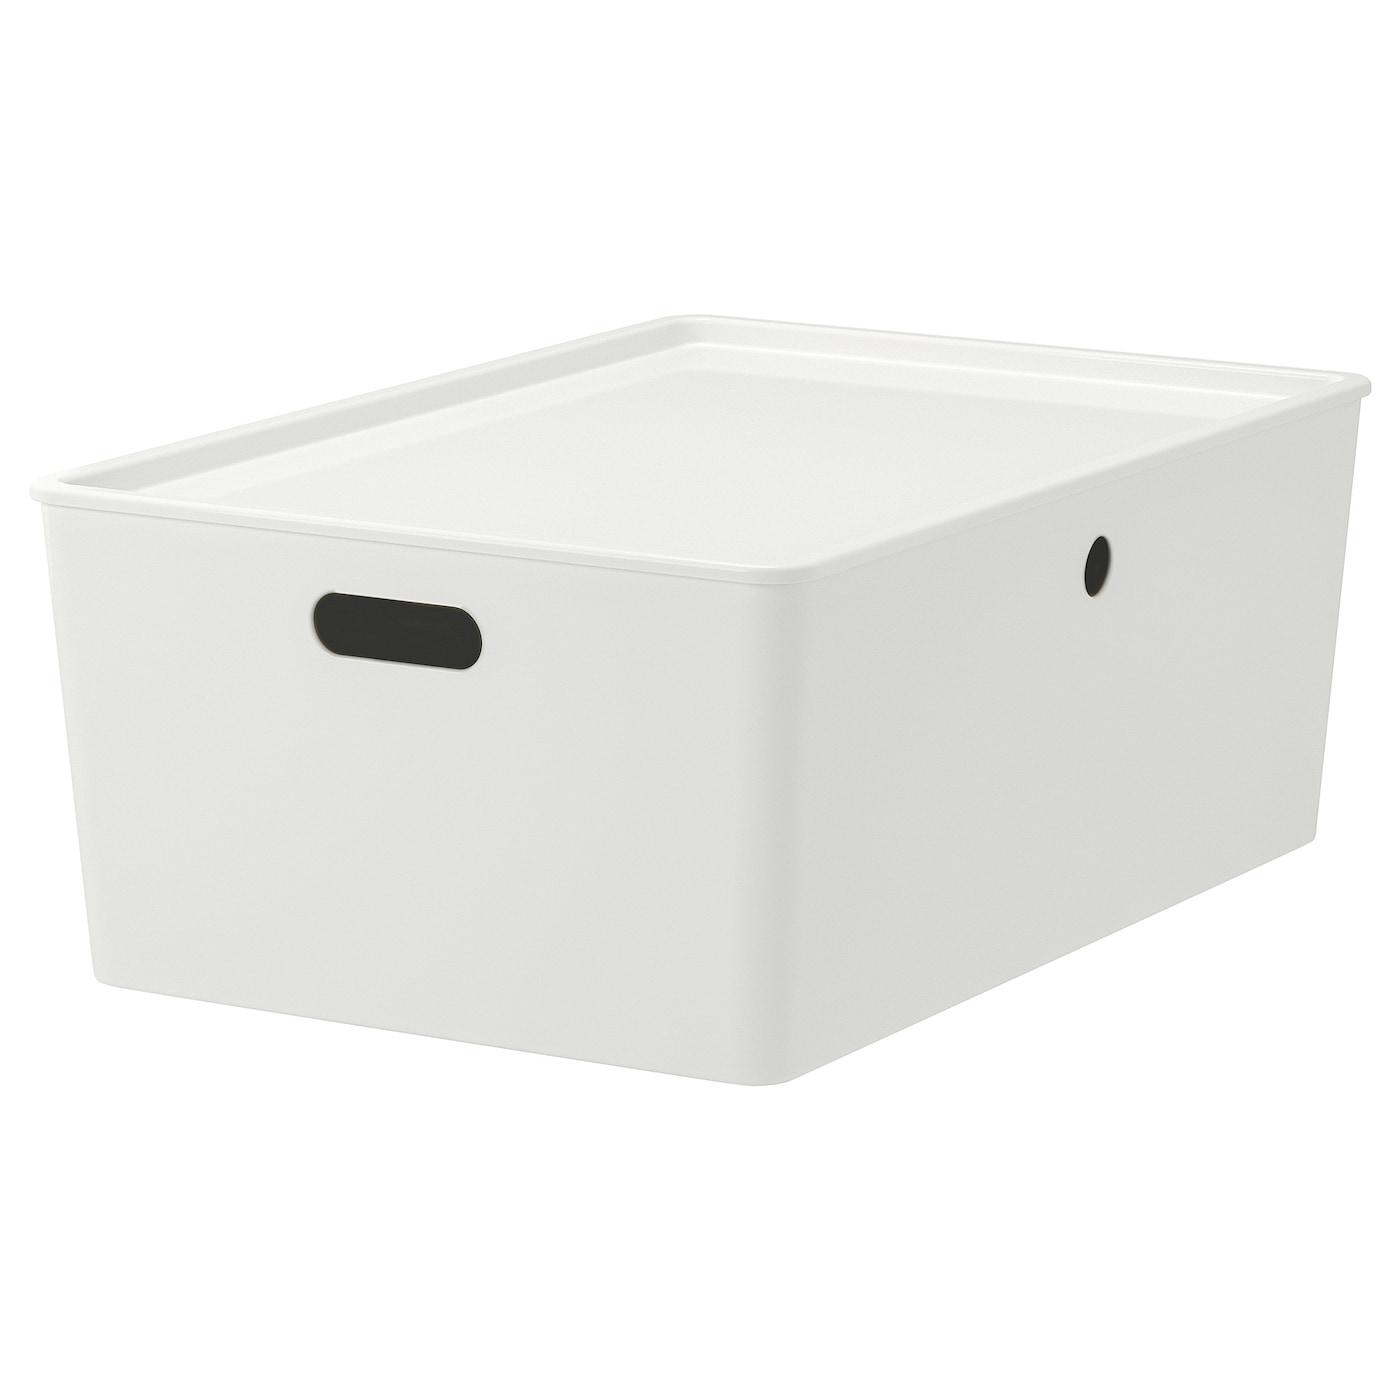 KUGGIS Box mit Deckel - weiß 16x16x16 cm